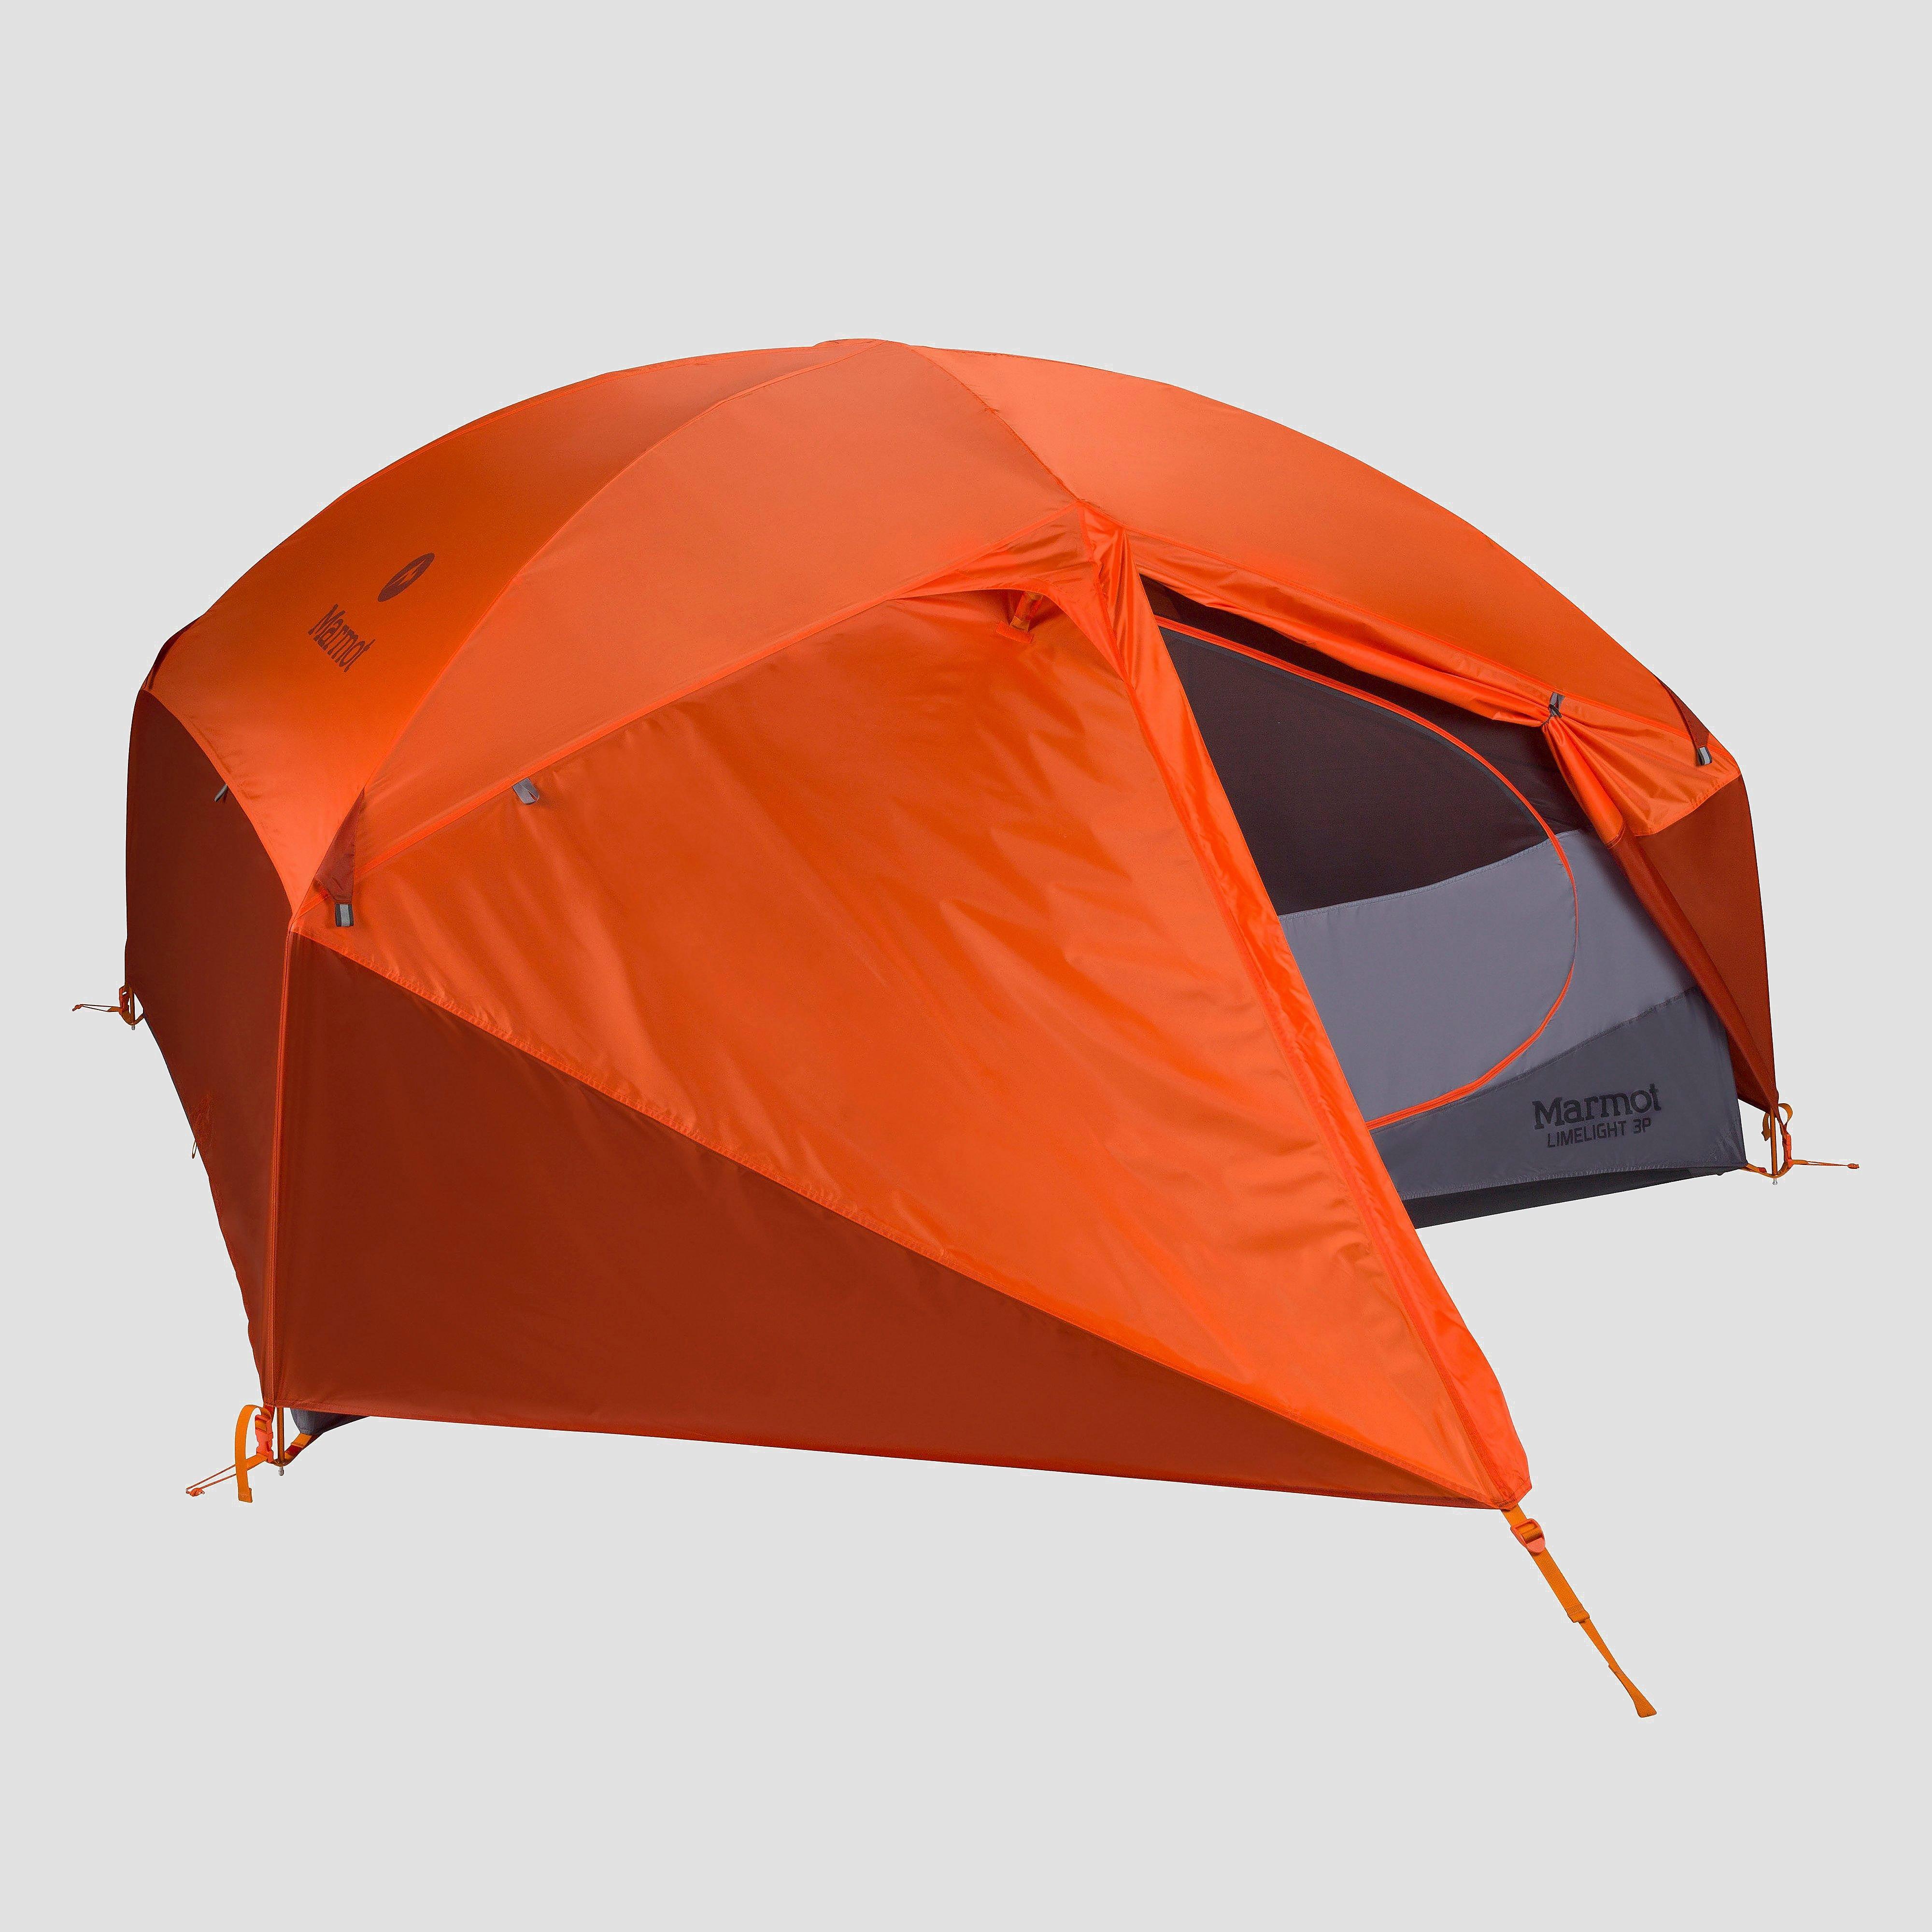 Marmot Limelight 3 Man Tent